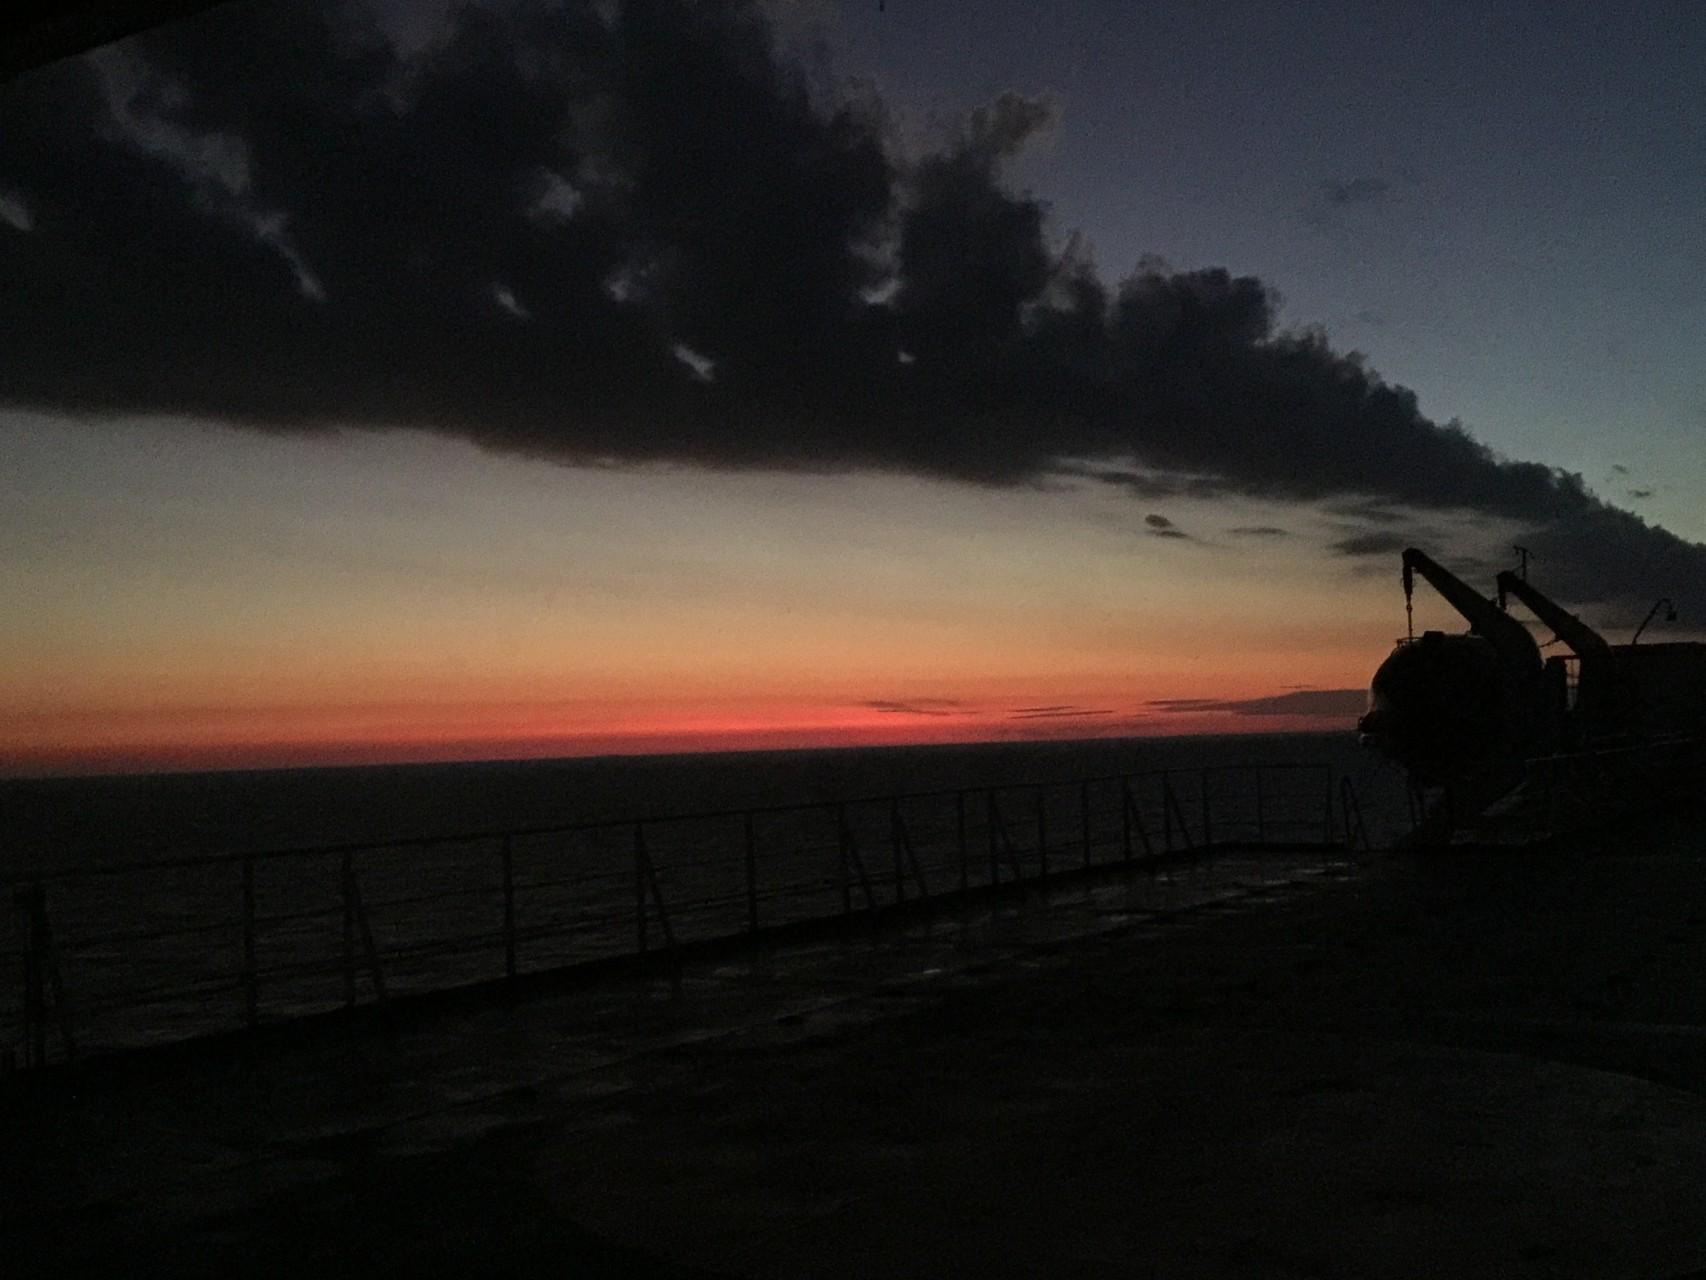 Sonnenaufgang auf dem Rio de la Plata